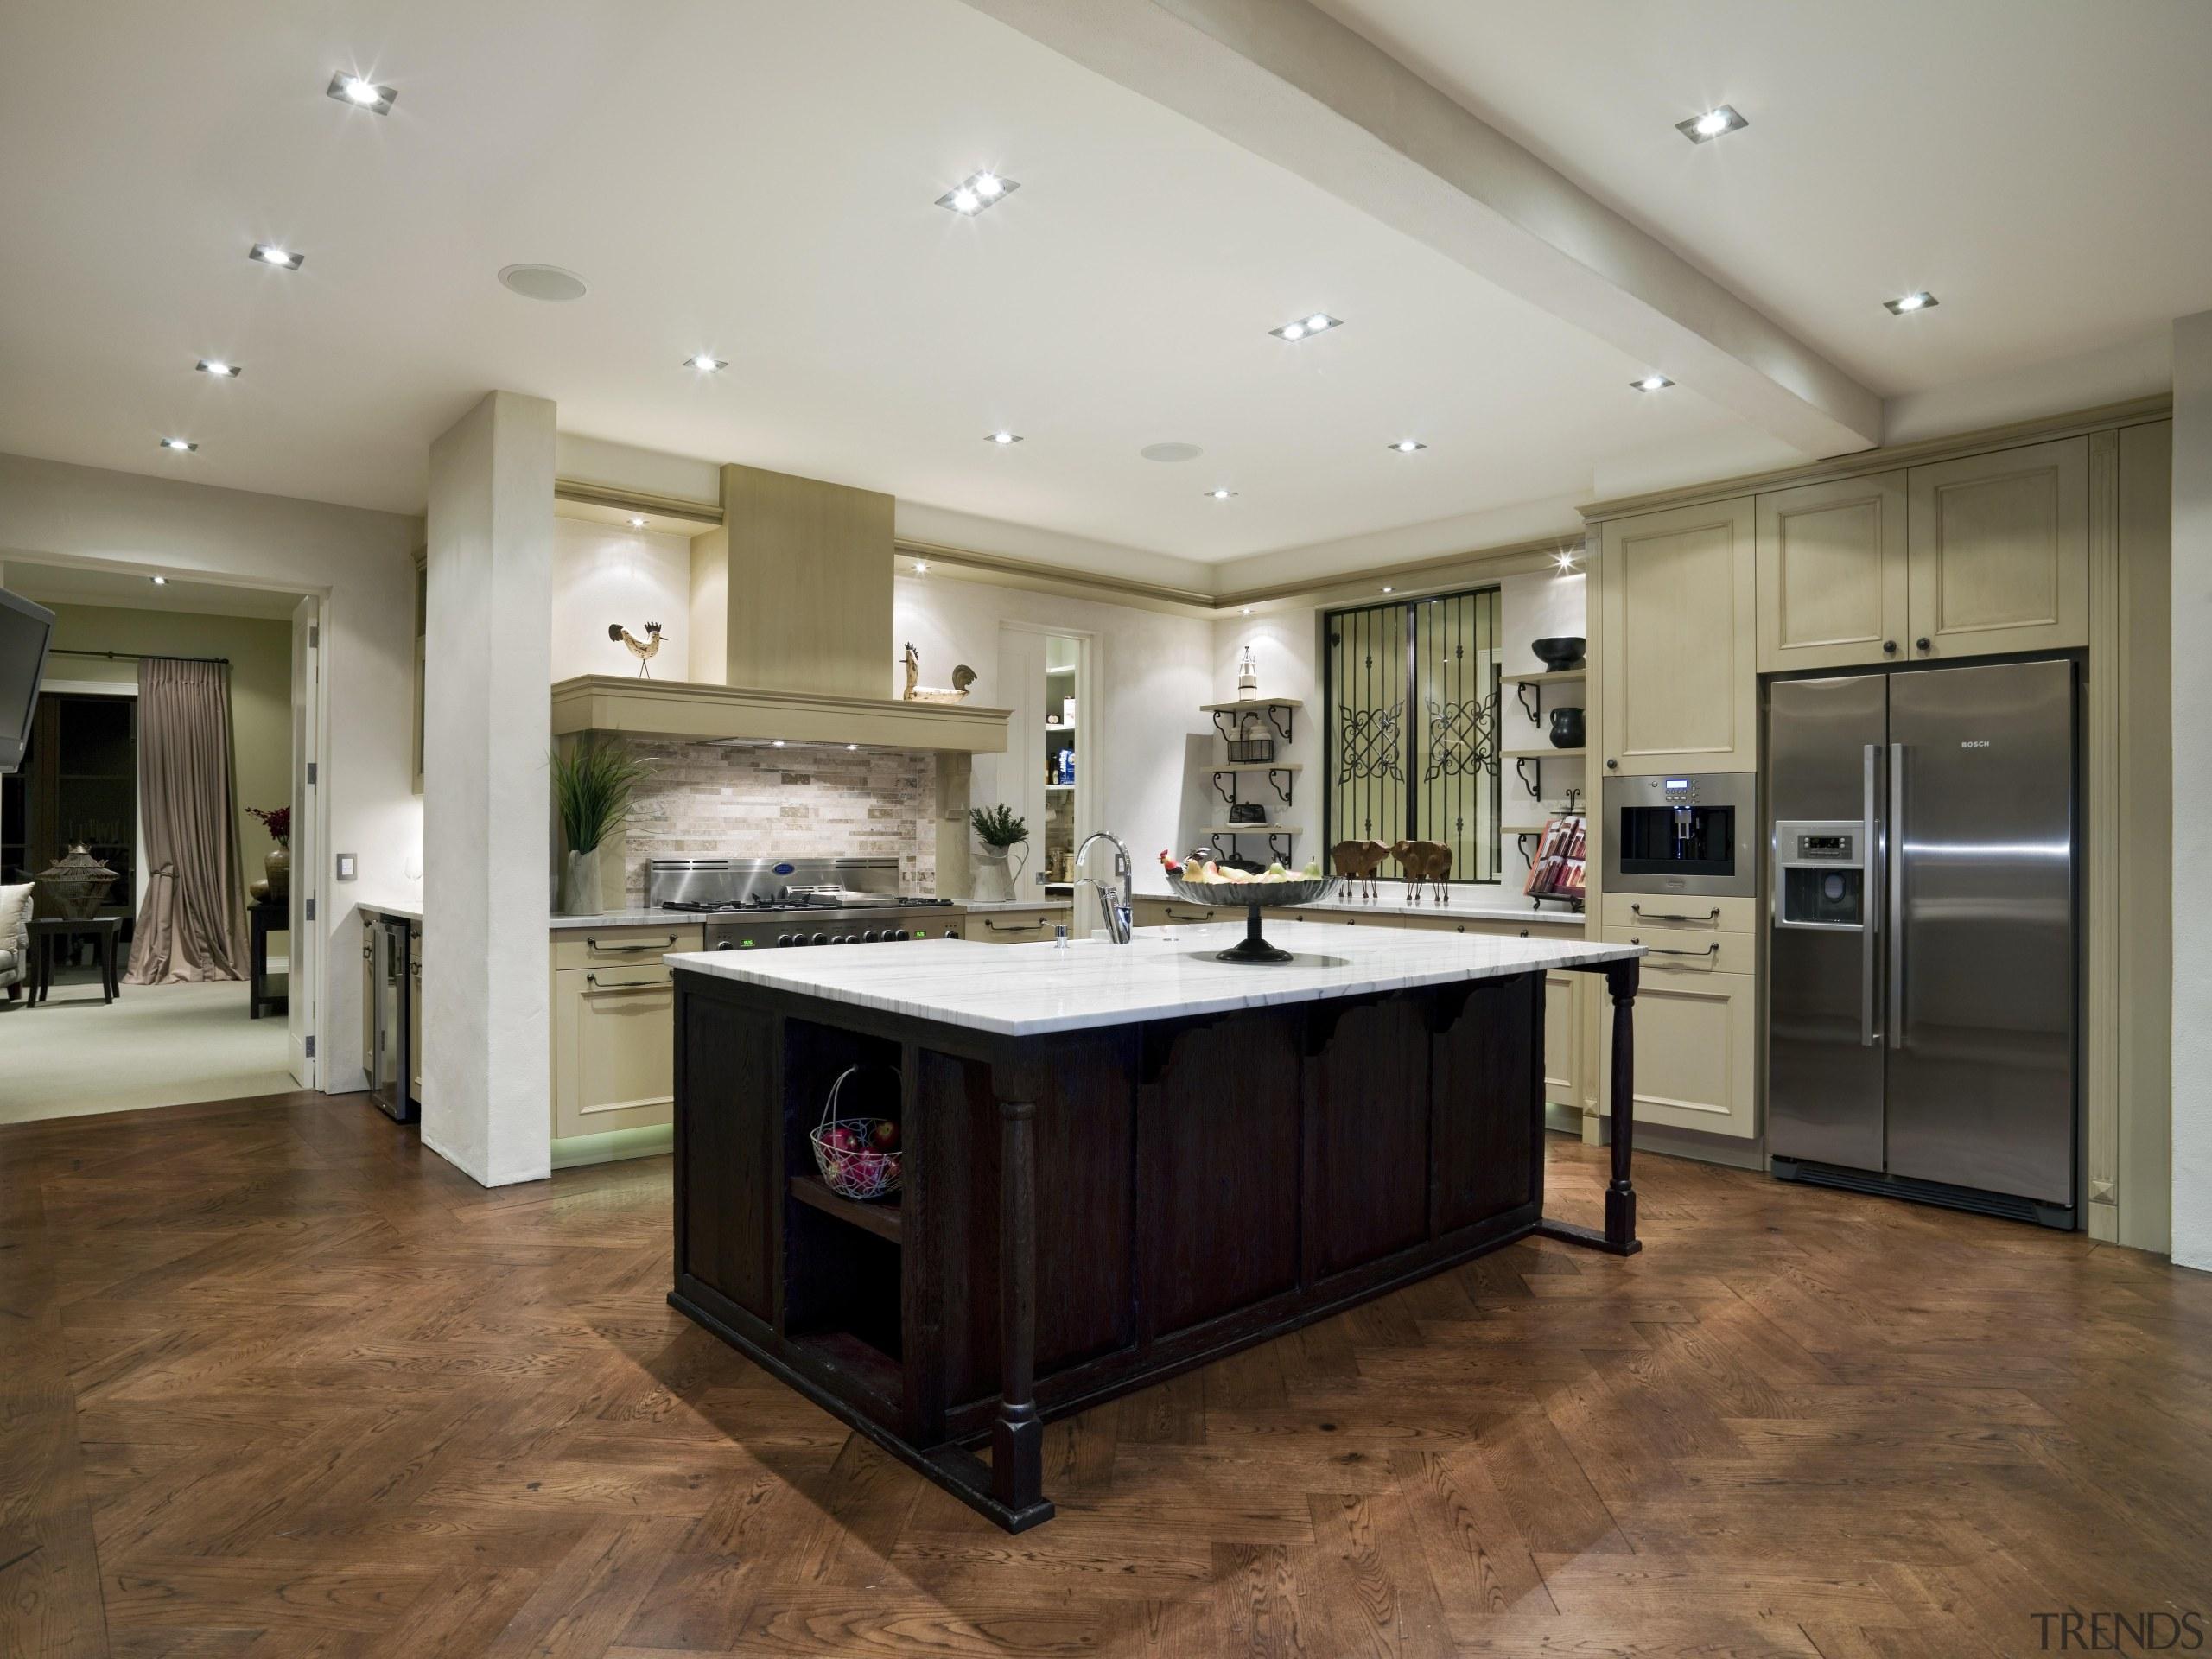 110goodlands 210 - Goodlands_210 - cabinetry | ceiling cabinetry, ceiling, countertop, floor, flooring, hardwood, interior design, kitchen, laminate flooring, real estate, room, wood flooring, gray, brown